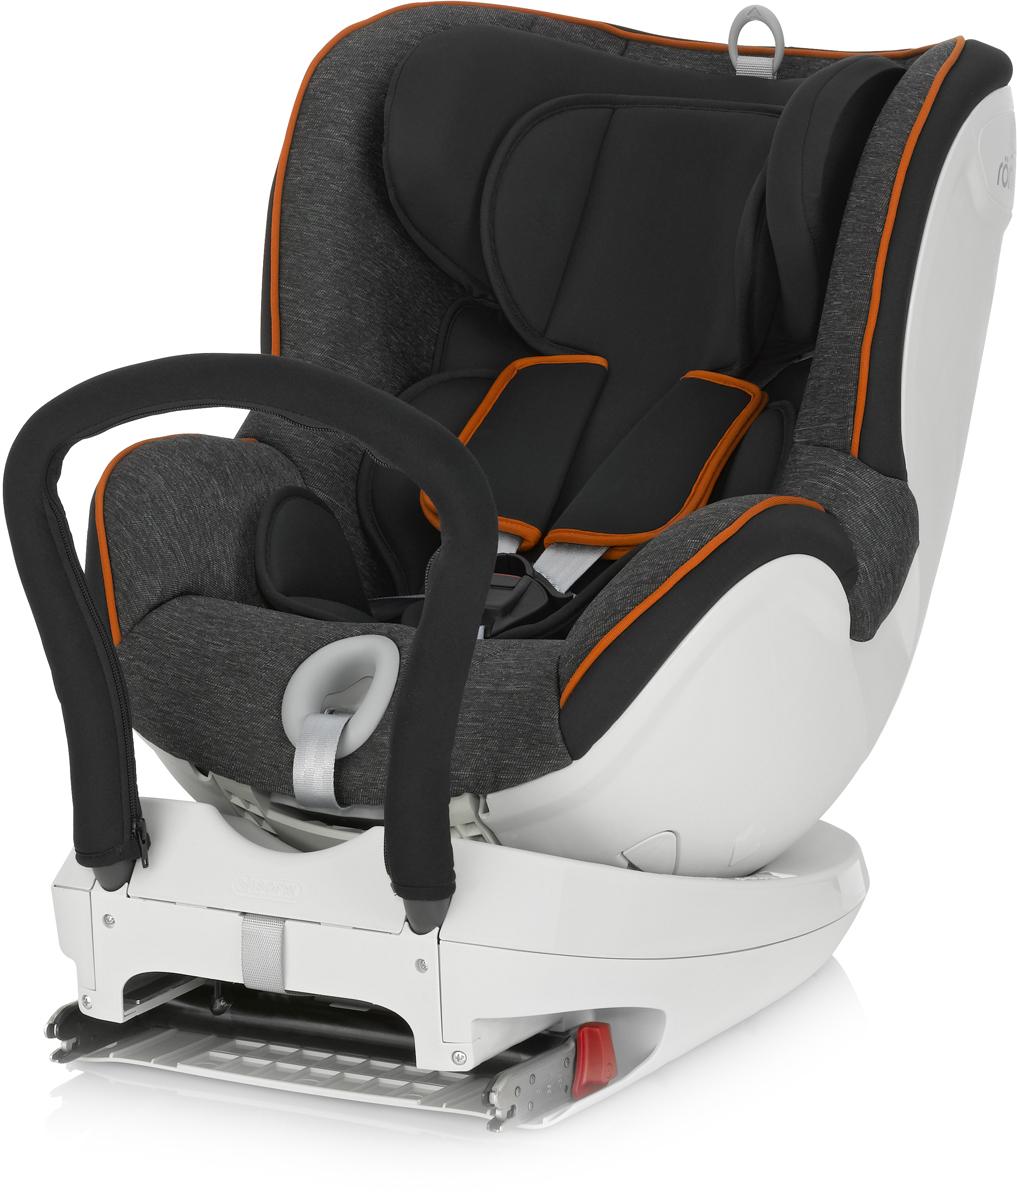 Romer Автокресло Dualfix Black Marble -  Автокресла и аксессуары